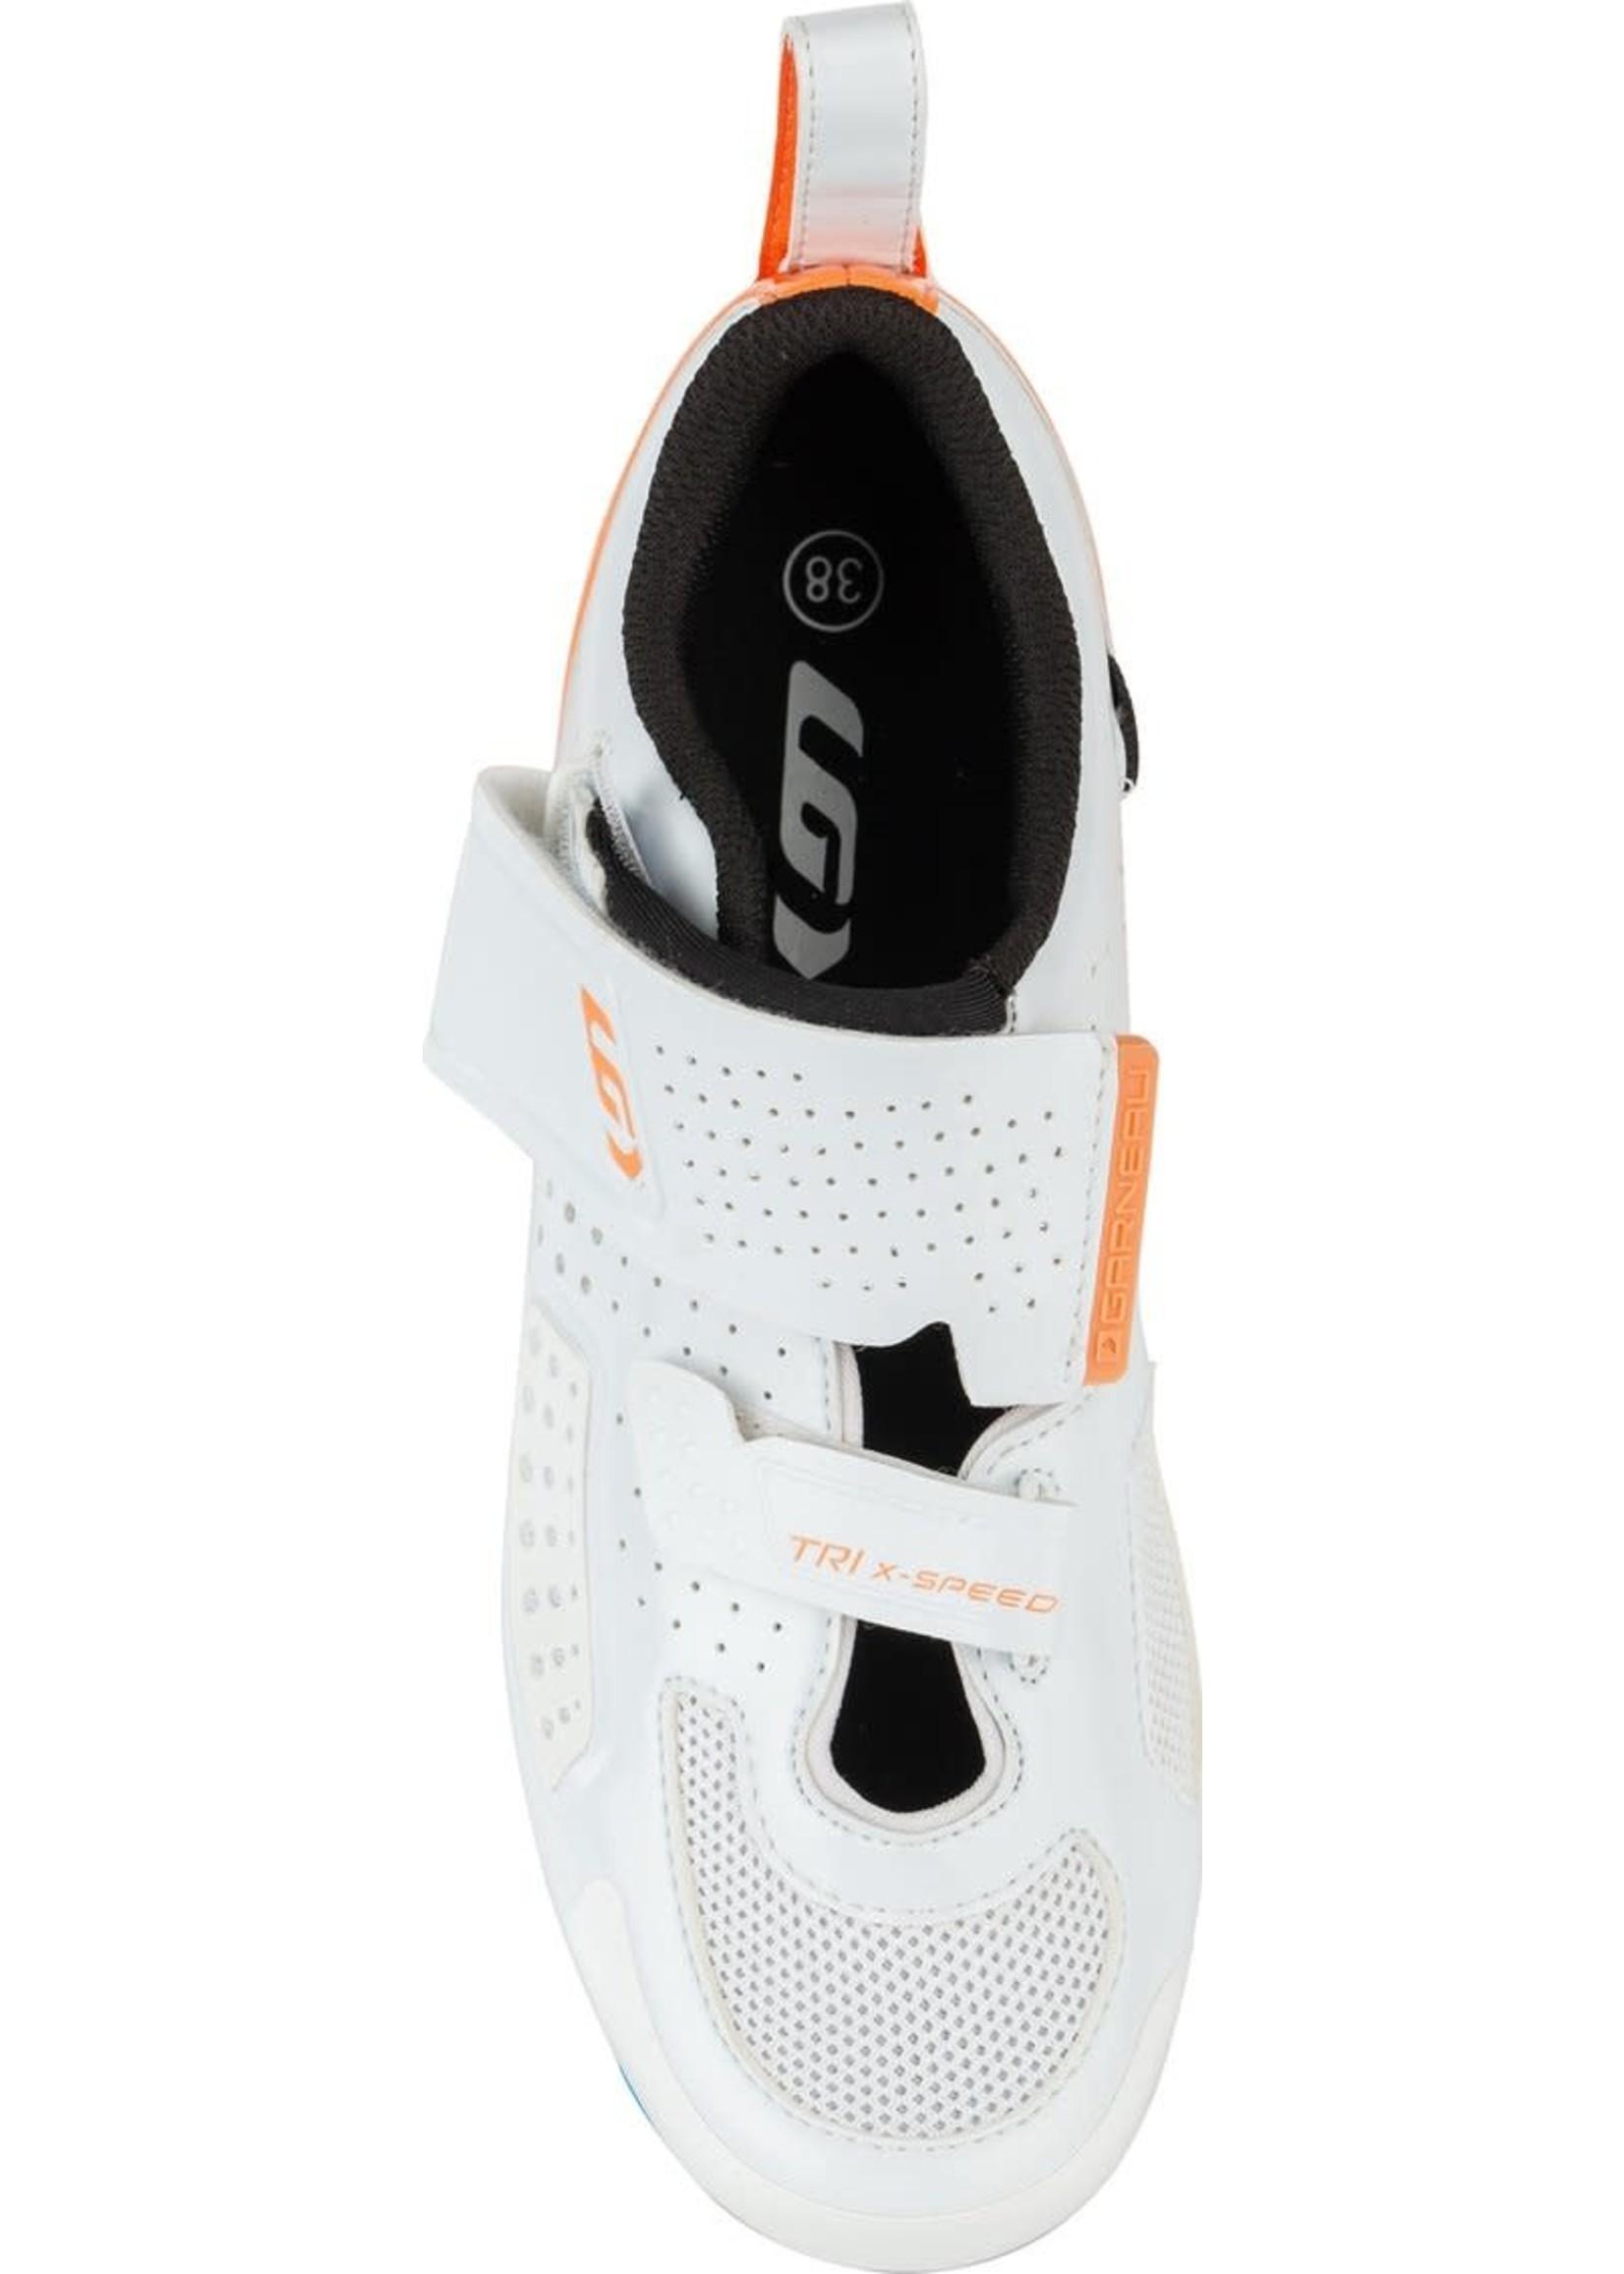 LOUIS GARNEAU Souliers Tri X-Speed IV / 40 / Blanc & orange